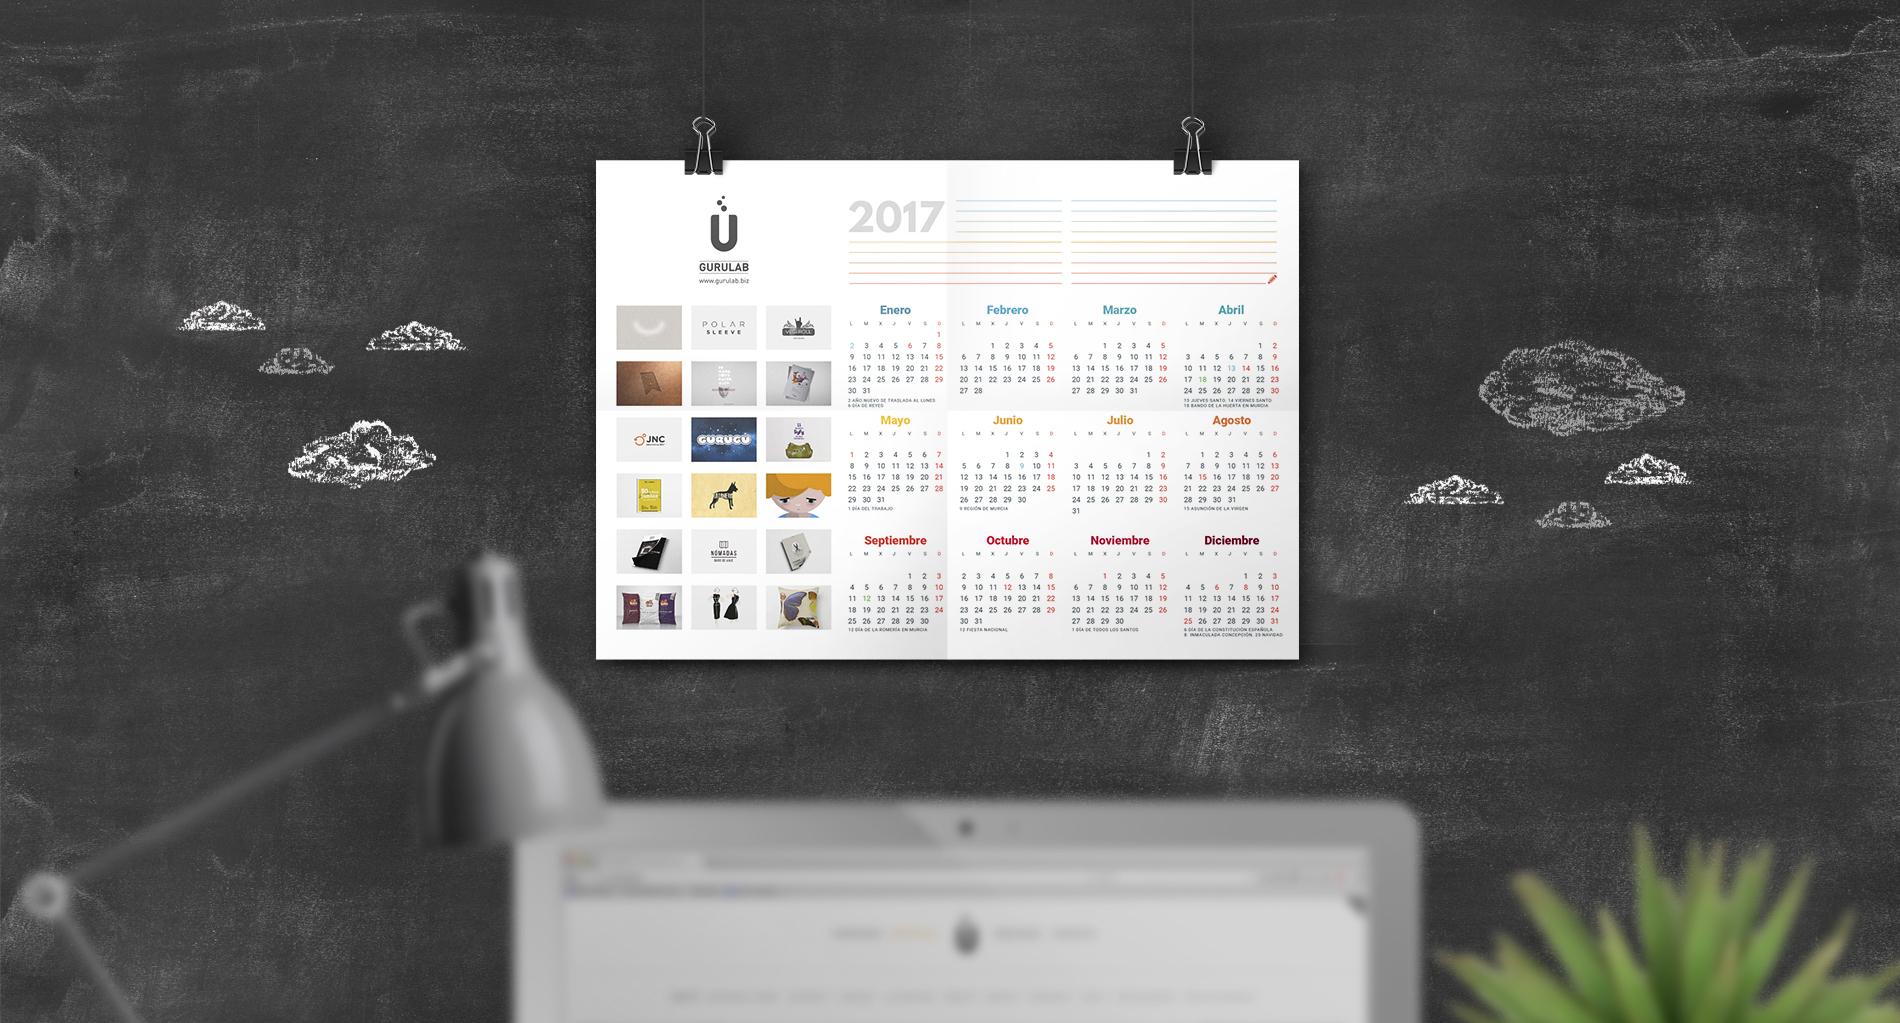 Calendario 2017 Gurulab